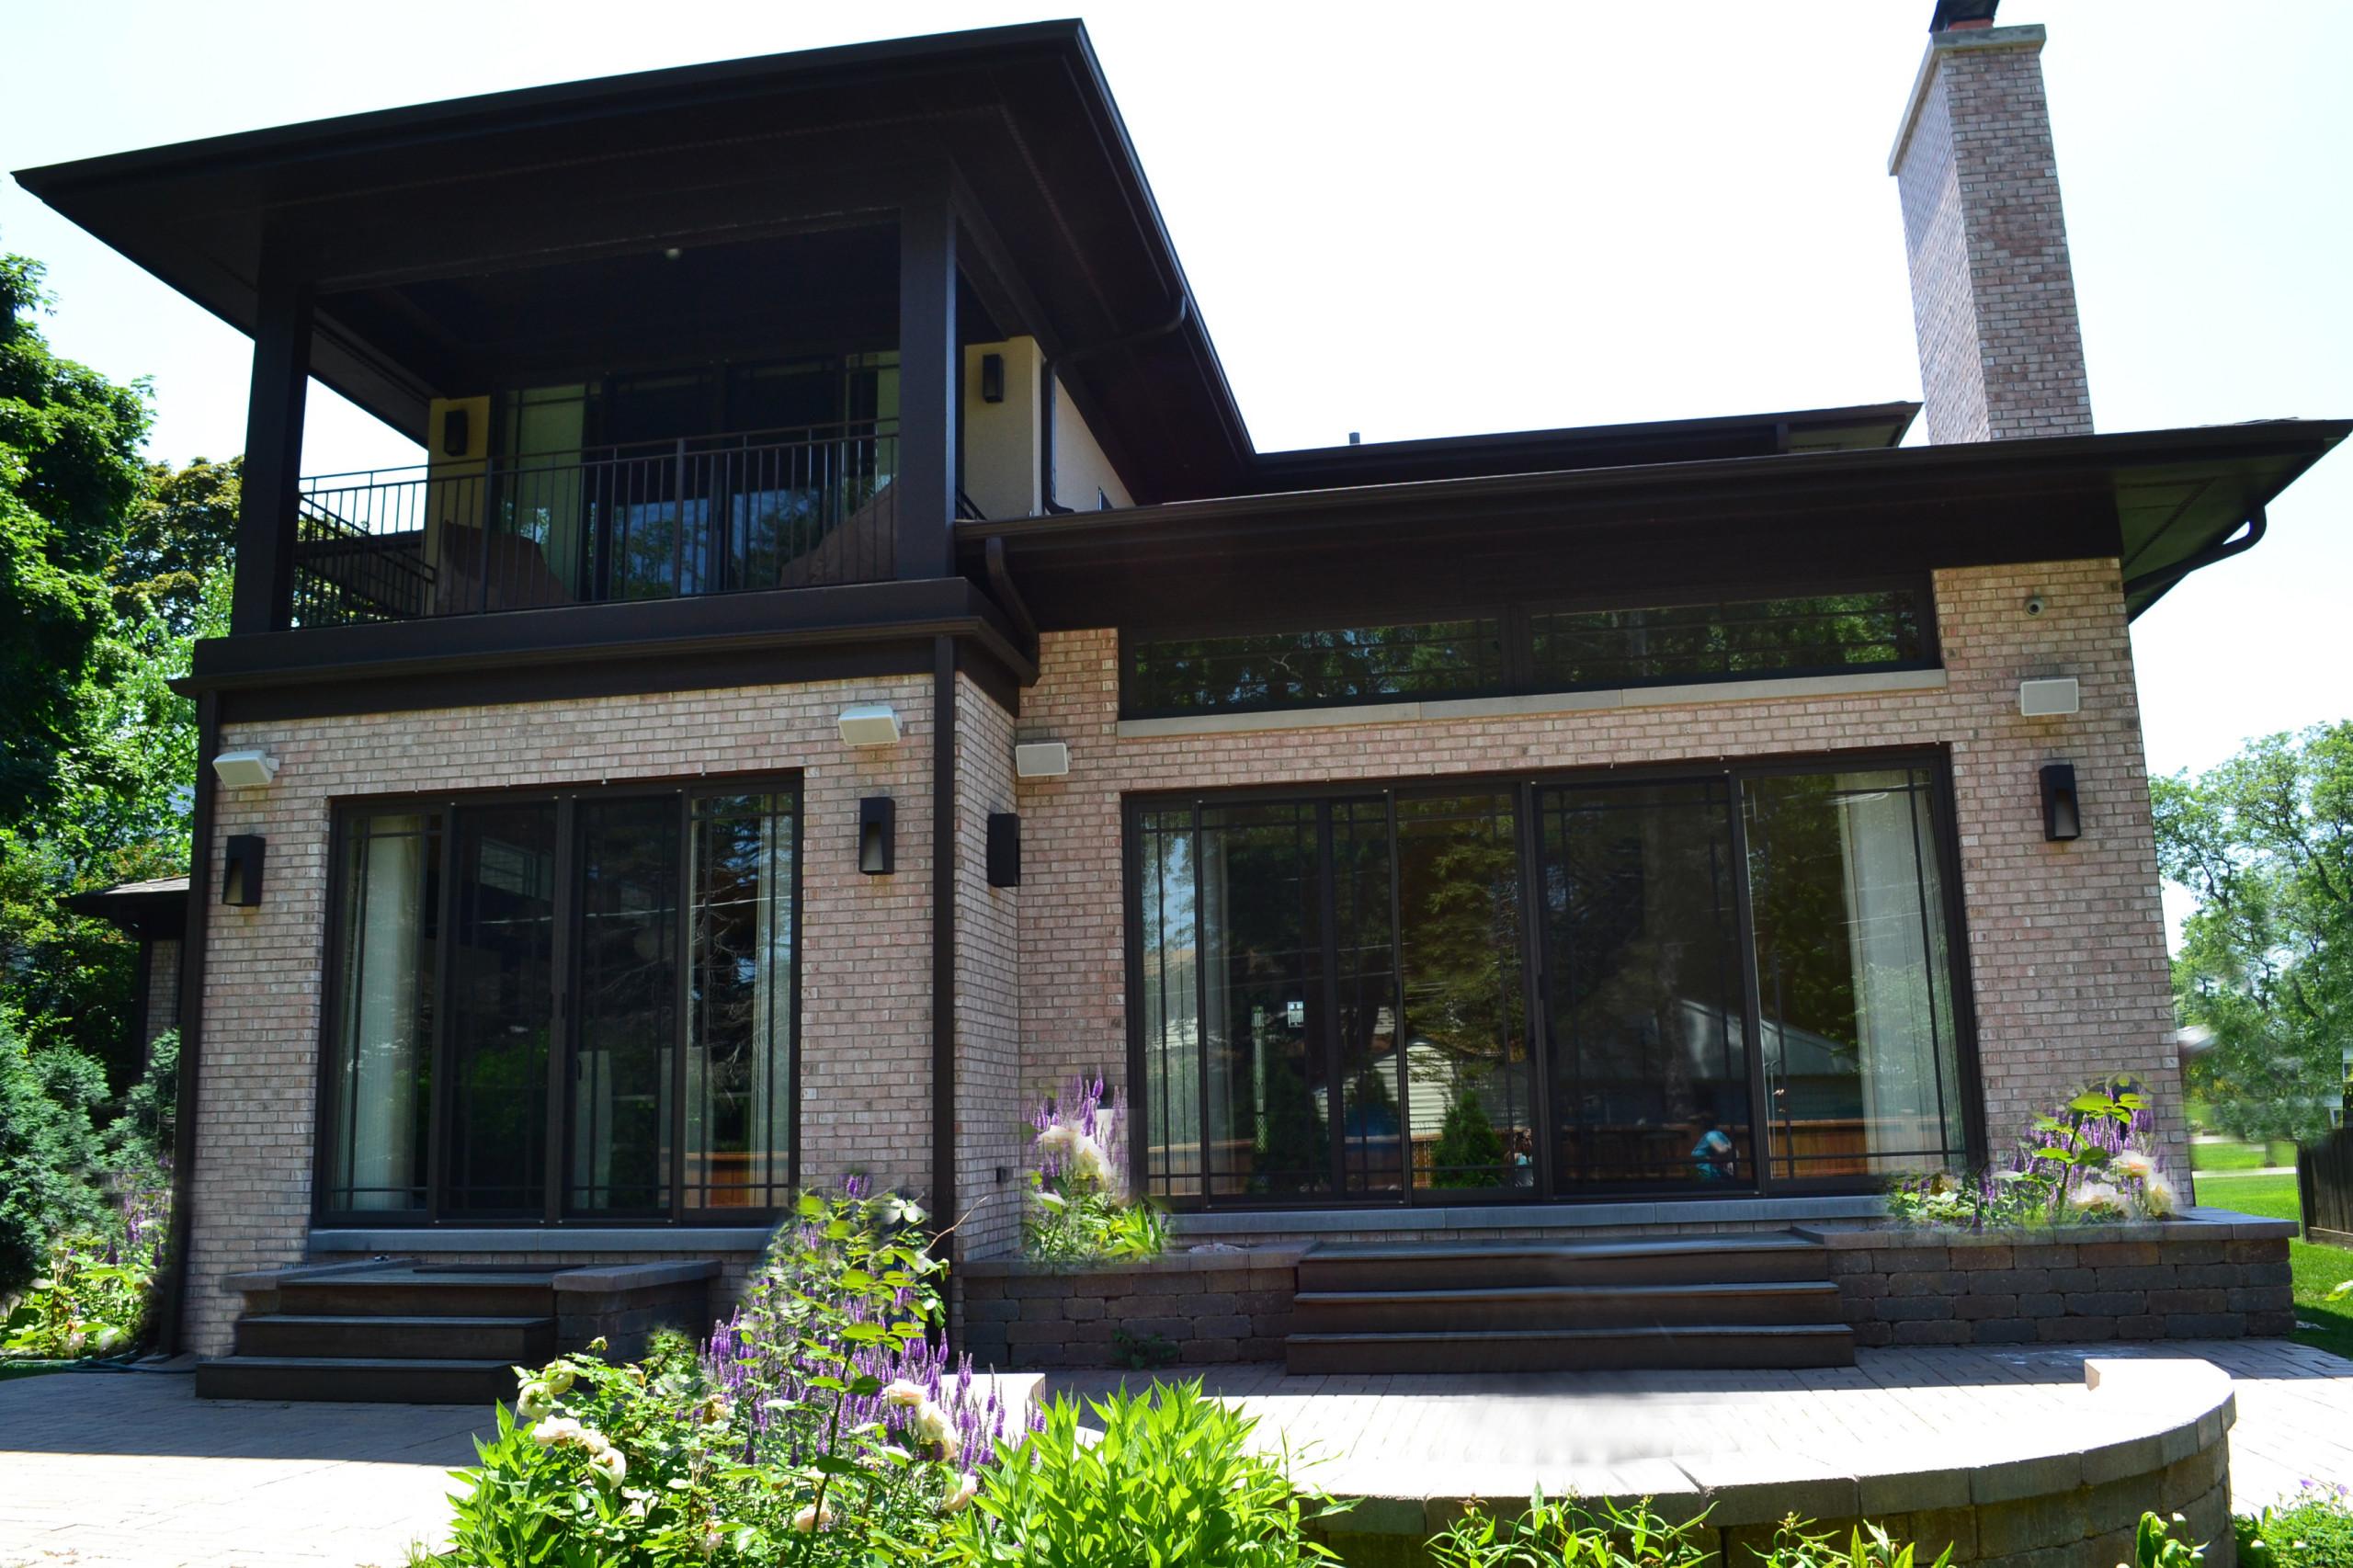 Prairy style residence